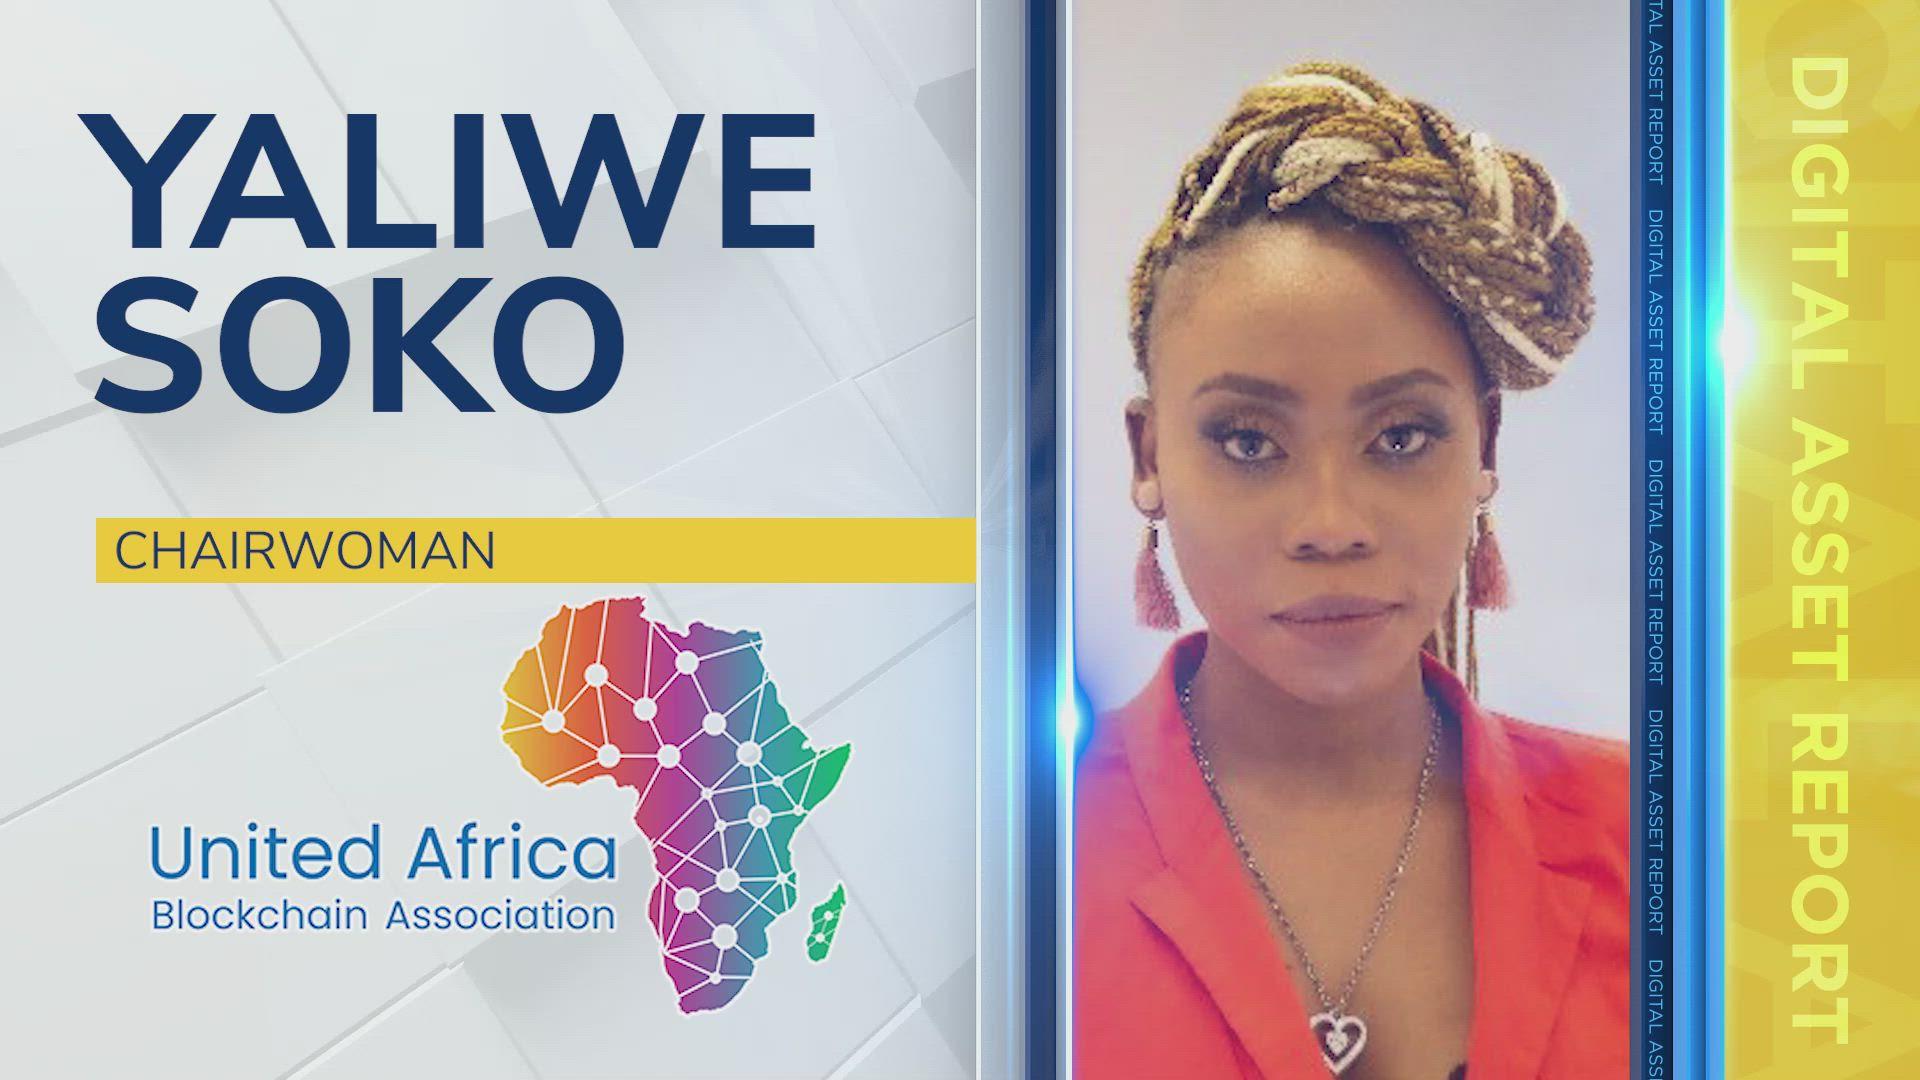 Yaliwe Soko, Chairwoman of the United Africa Blockchain Association